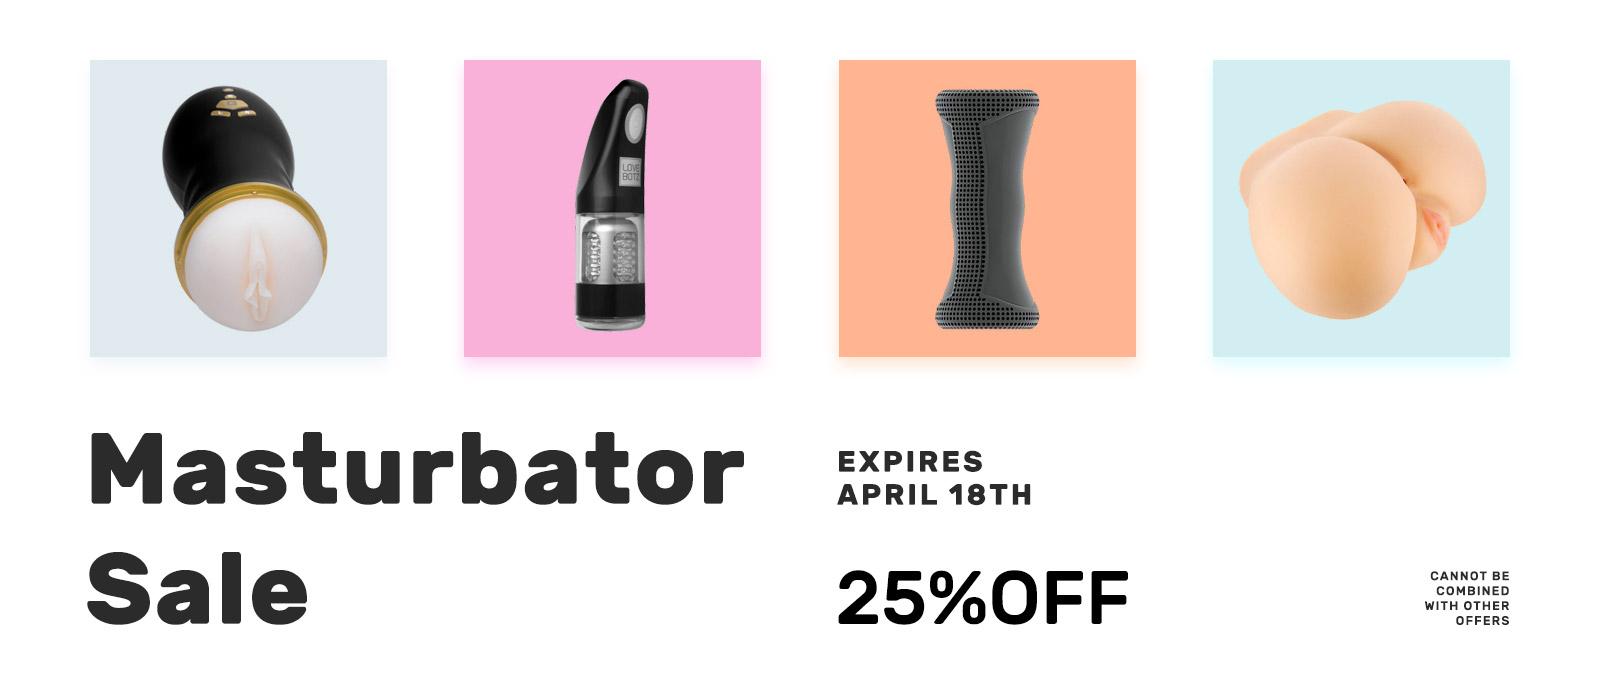 25% off masturbator sale